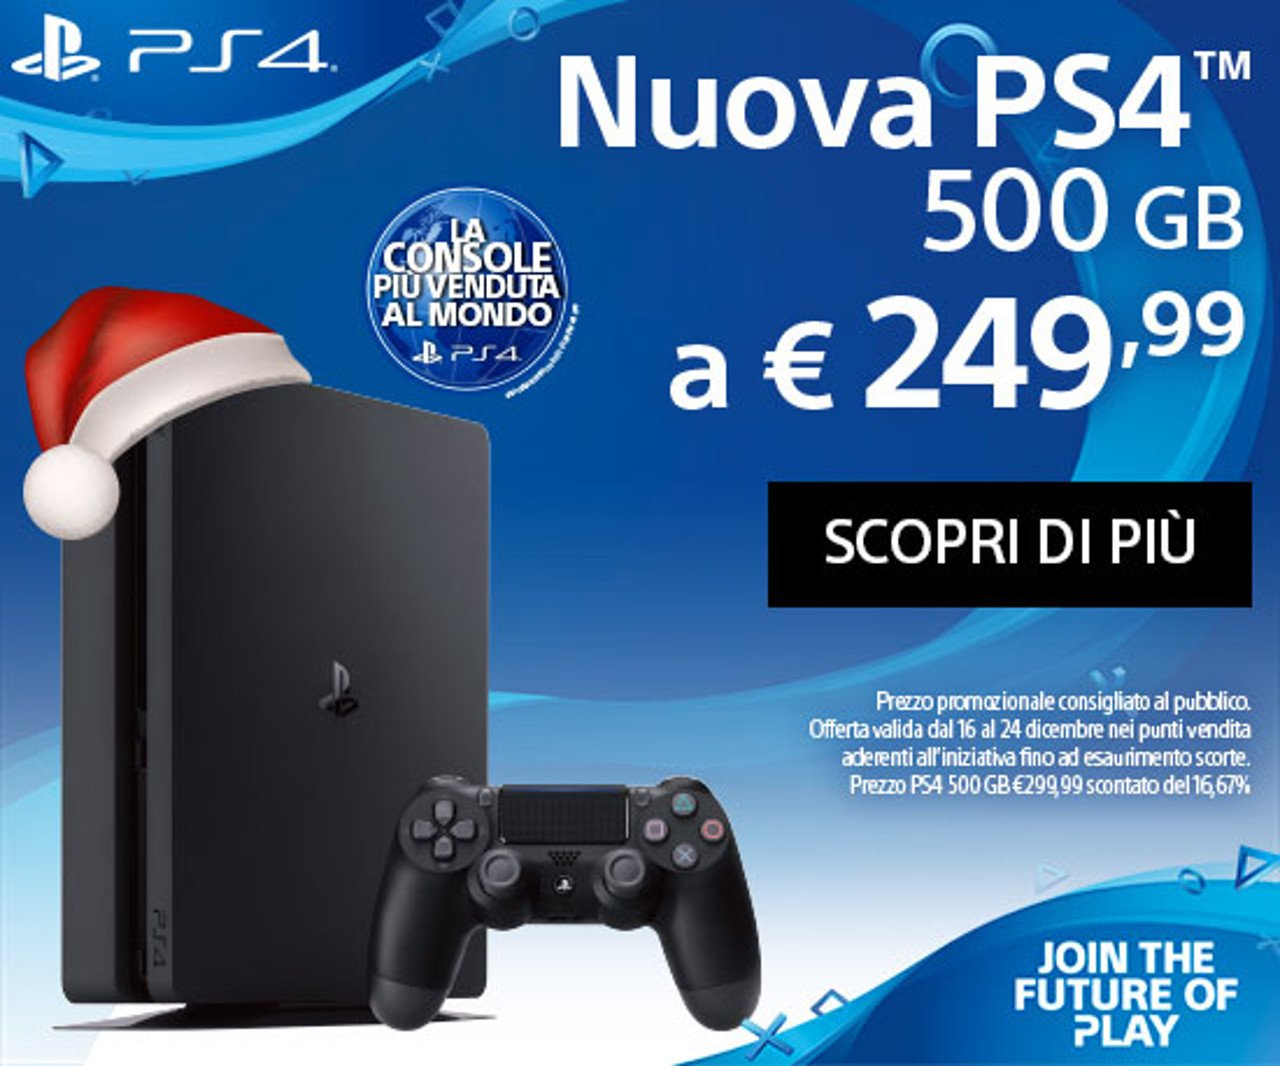 PlayStation 4 Slim 500 GB è in offerta a 249,99 €